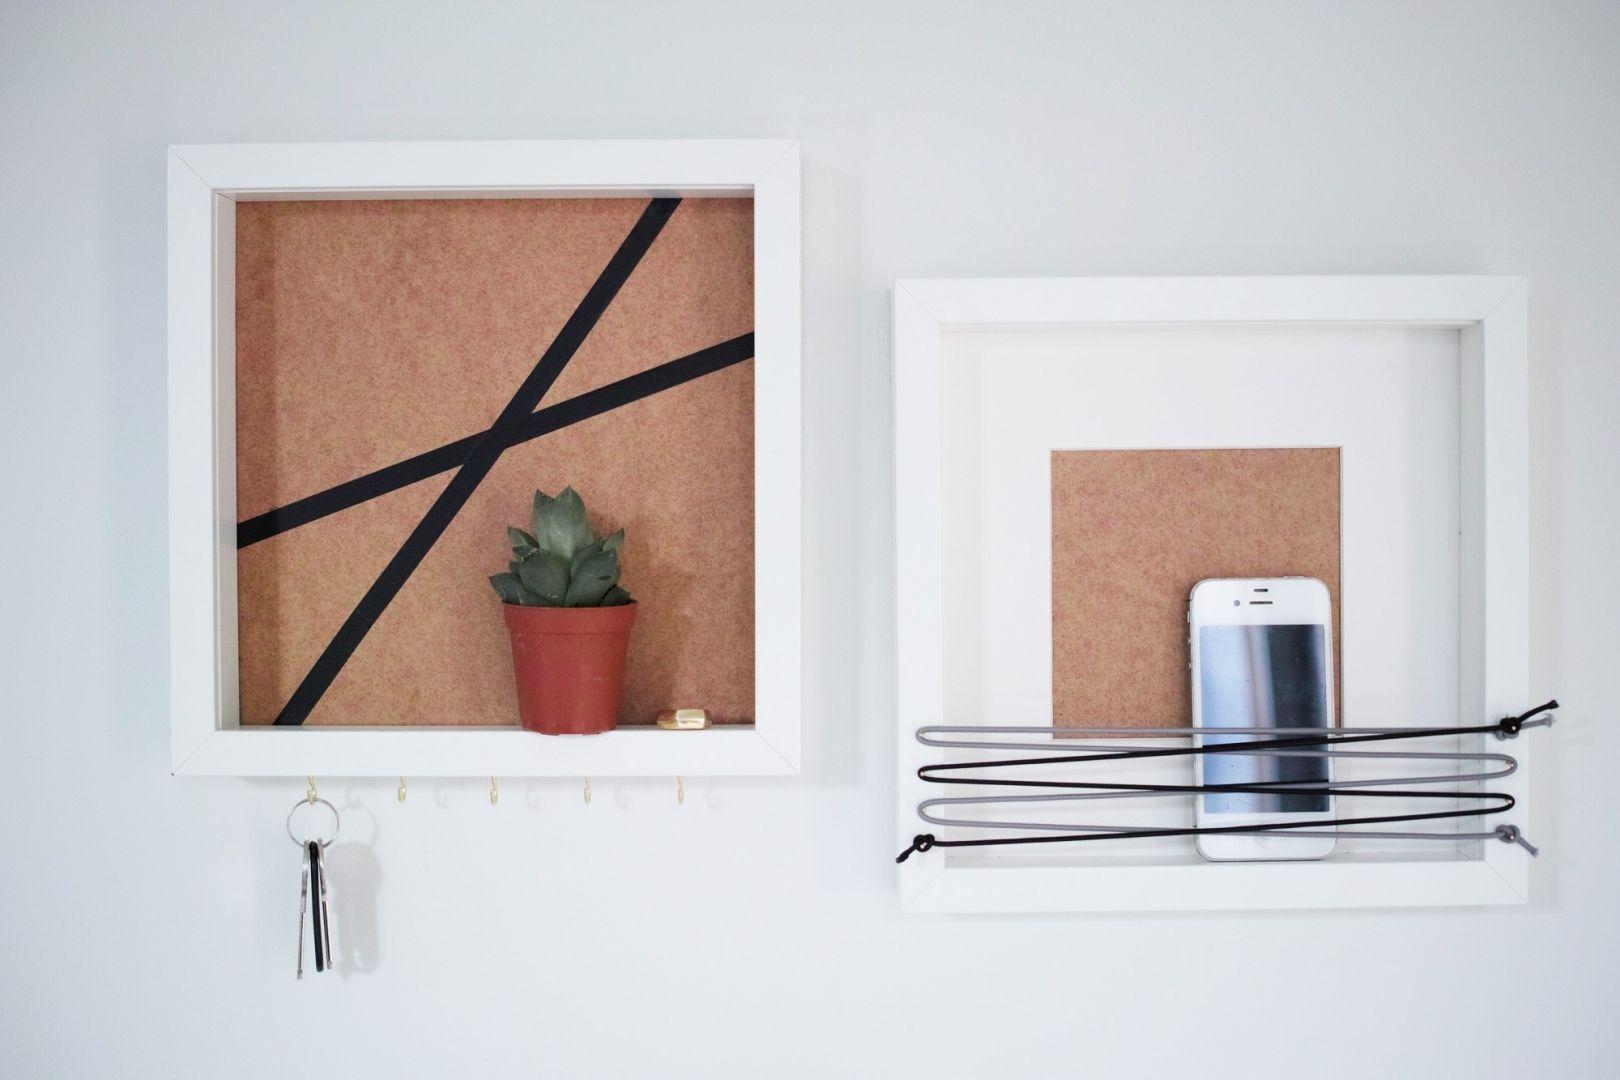 diy jugendzimmer schl sselbrett schl sselbrett selber. Black Bedroom Furniture Sets. Home Design Ideas